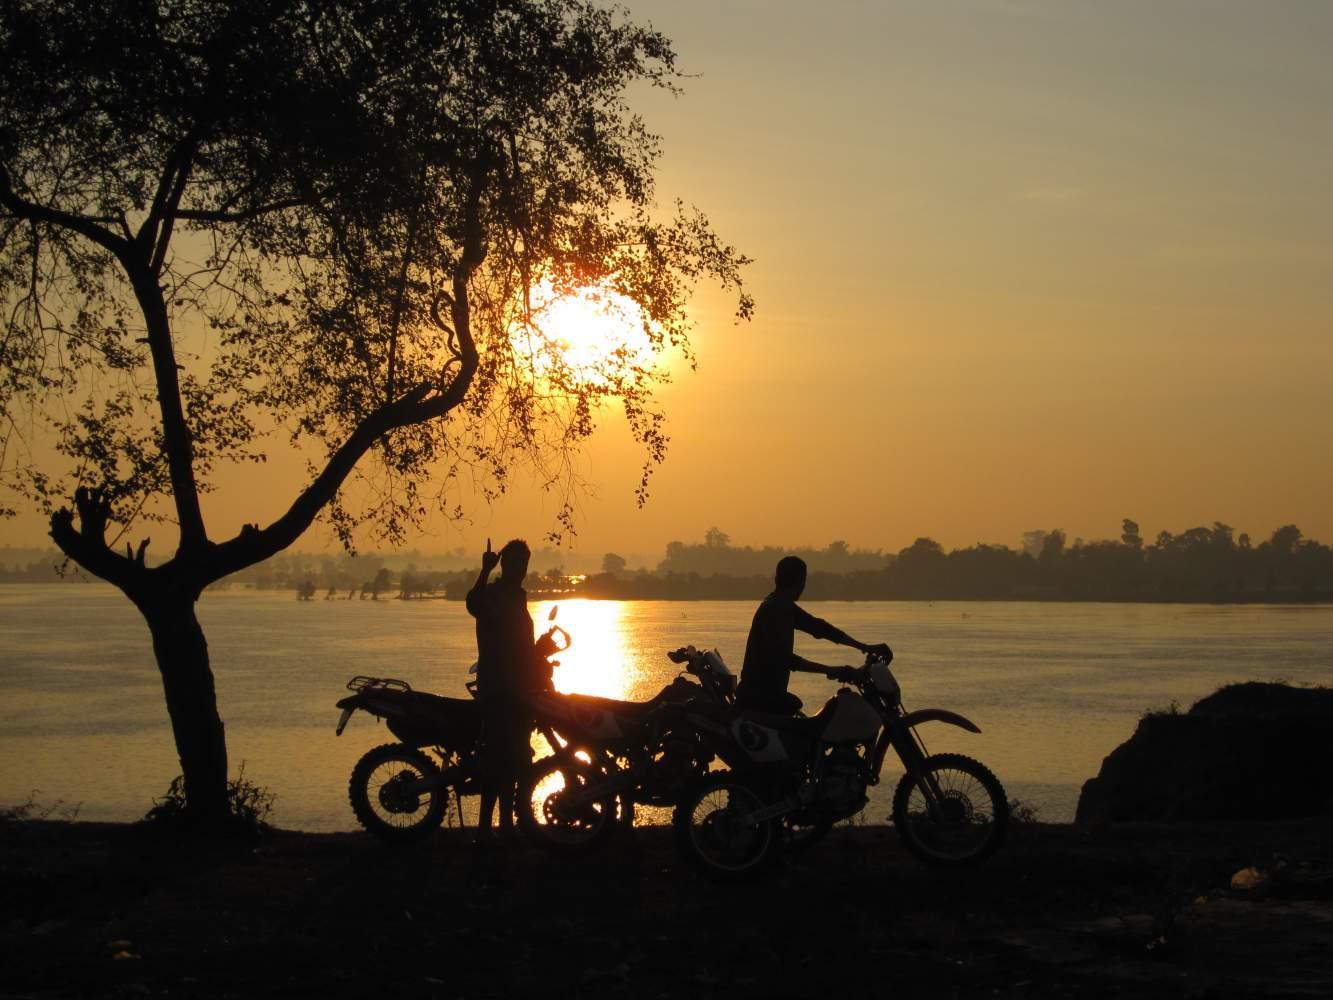 Endurofahrer im Motorradparadis Kambodscha Sonnenuntergang